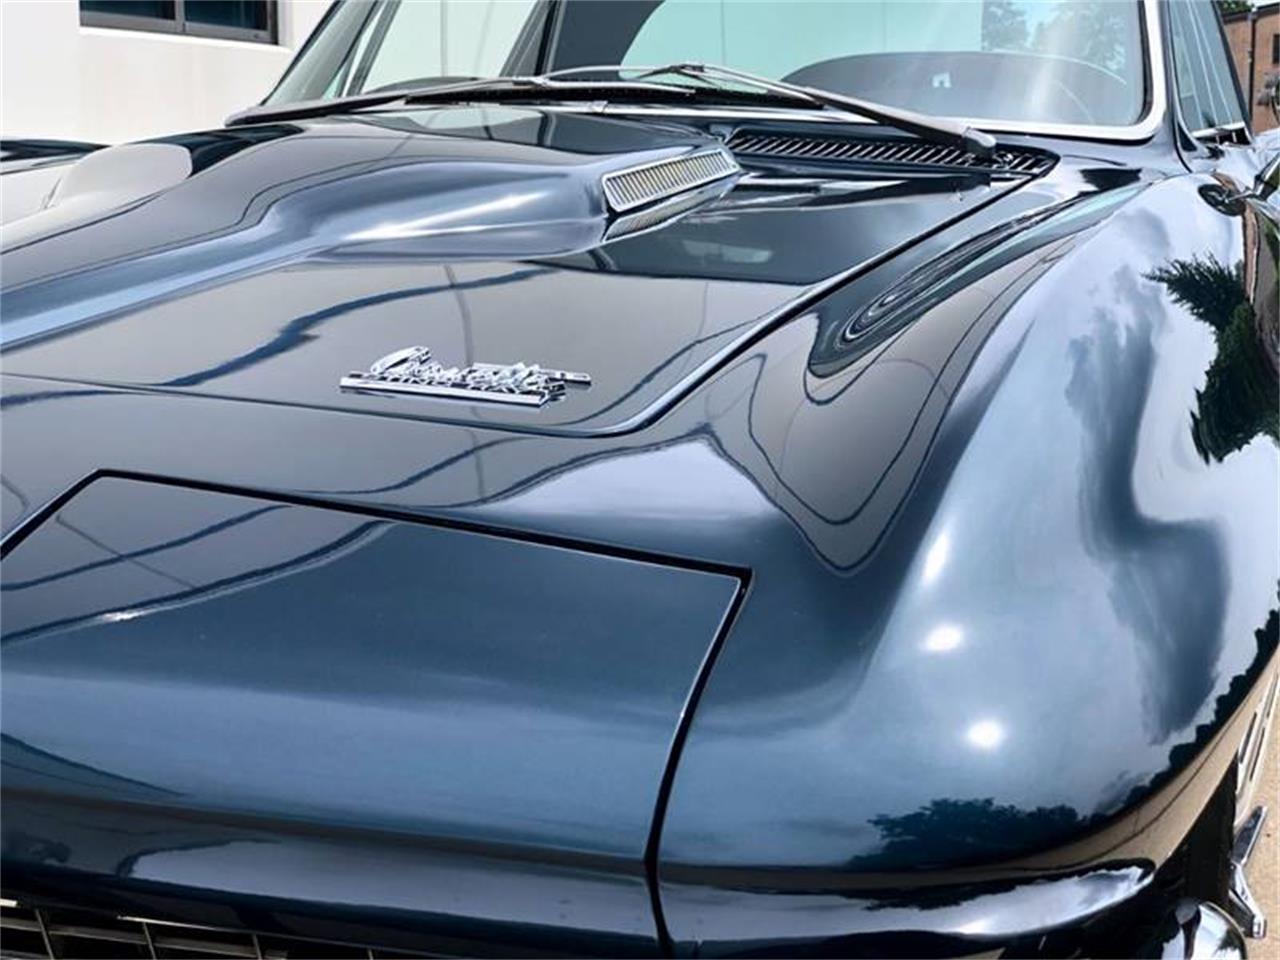 1966 Chevrolet Corvette (CC-1262527) for sale in Burr Ridge, Illinois